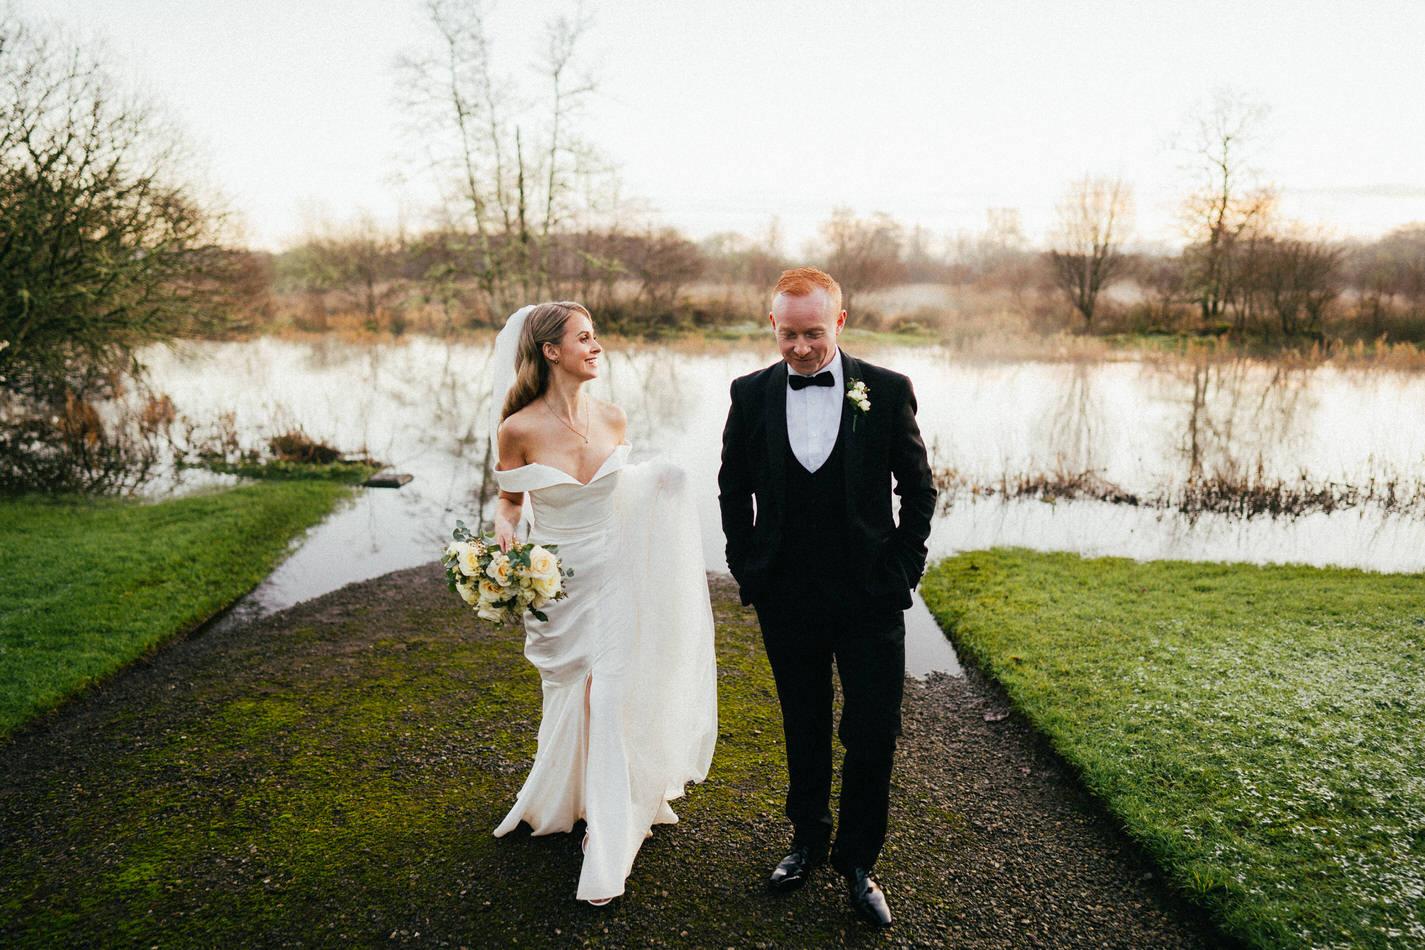 Castle-wedding-ireland-photos- 0229 169